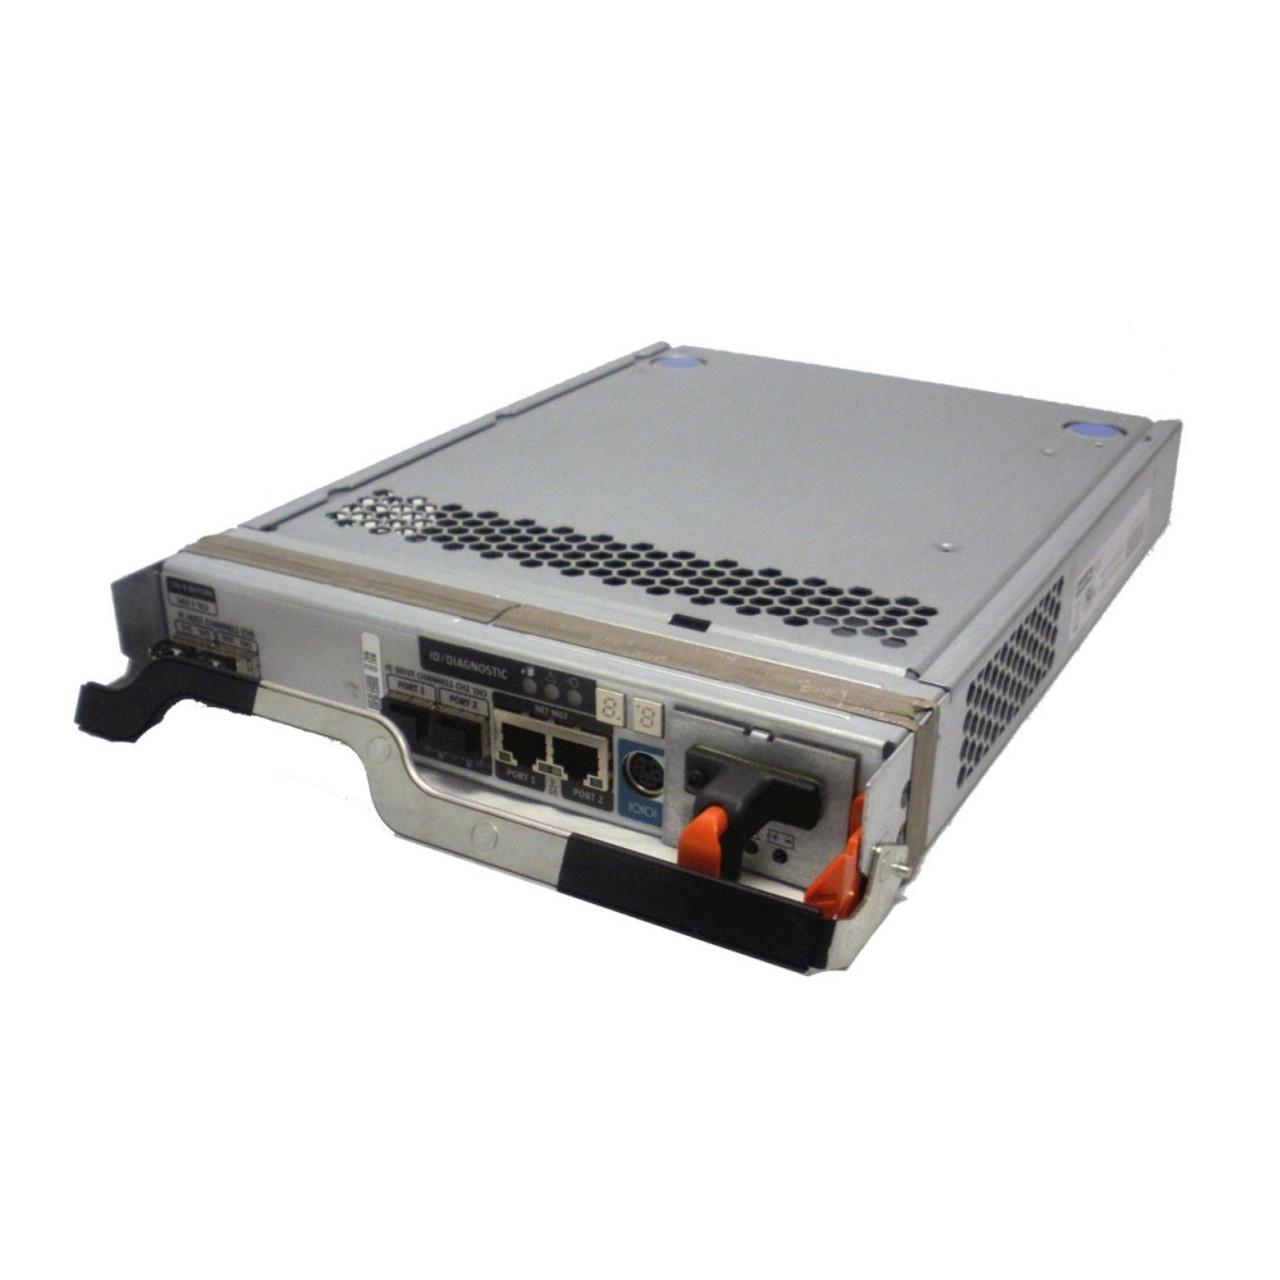 SUN 375-3630 StorageTek 6180 2GB FC Raid 2 Port Controller